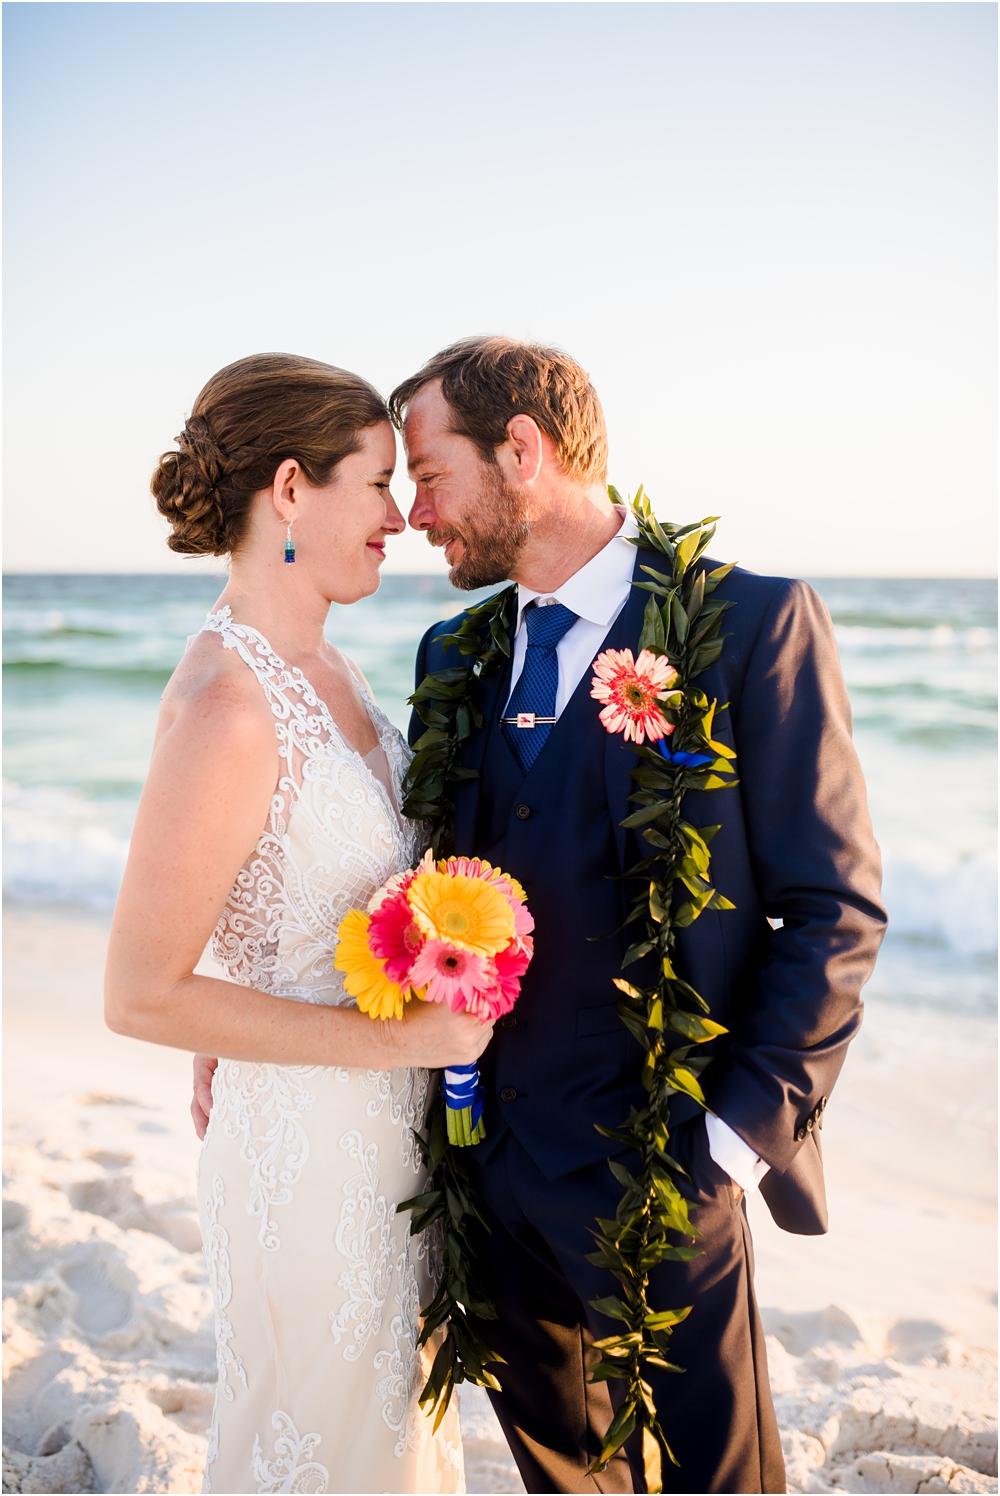 ledman-wedding-kiersten-stevenson-photography-30a-panama-city-beach-dothan-tallahassee-(462-of-763).JPG